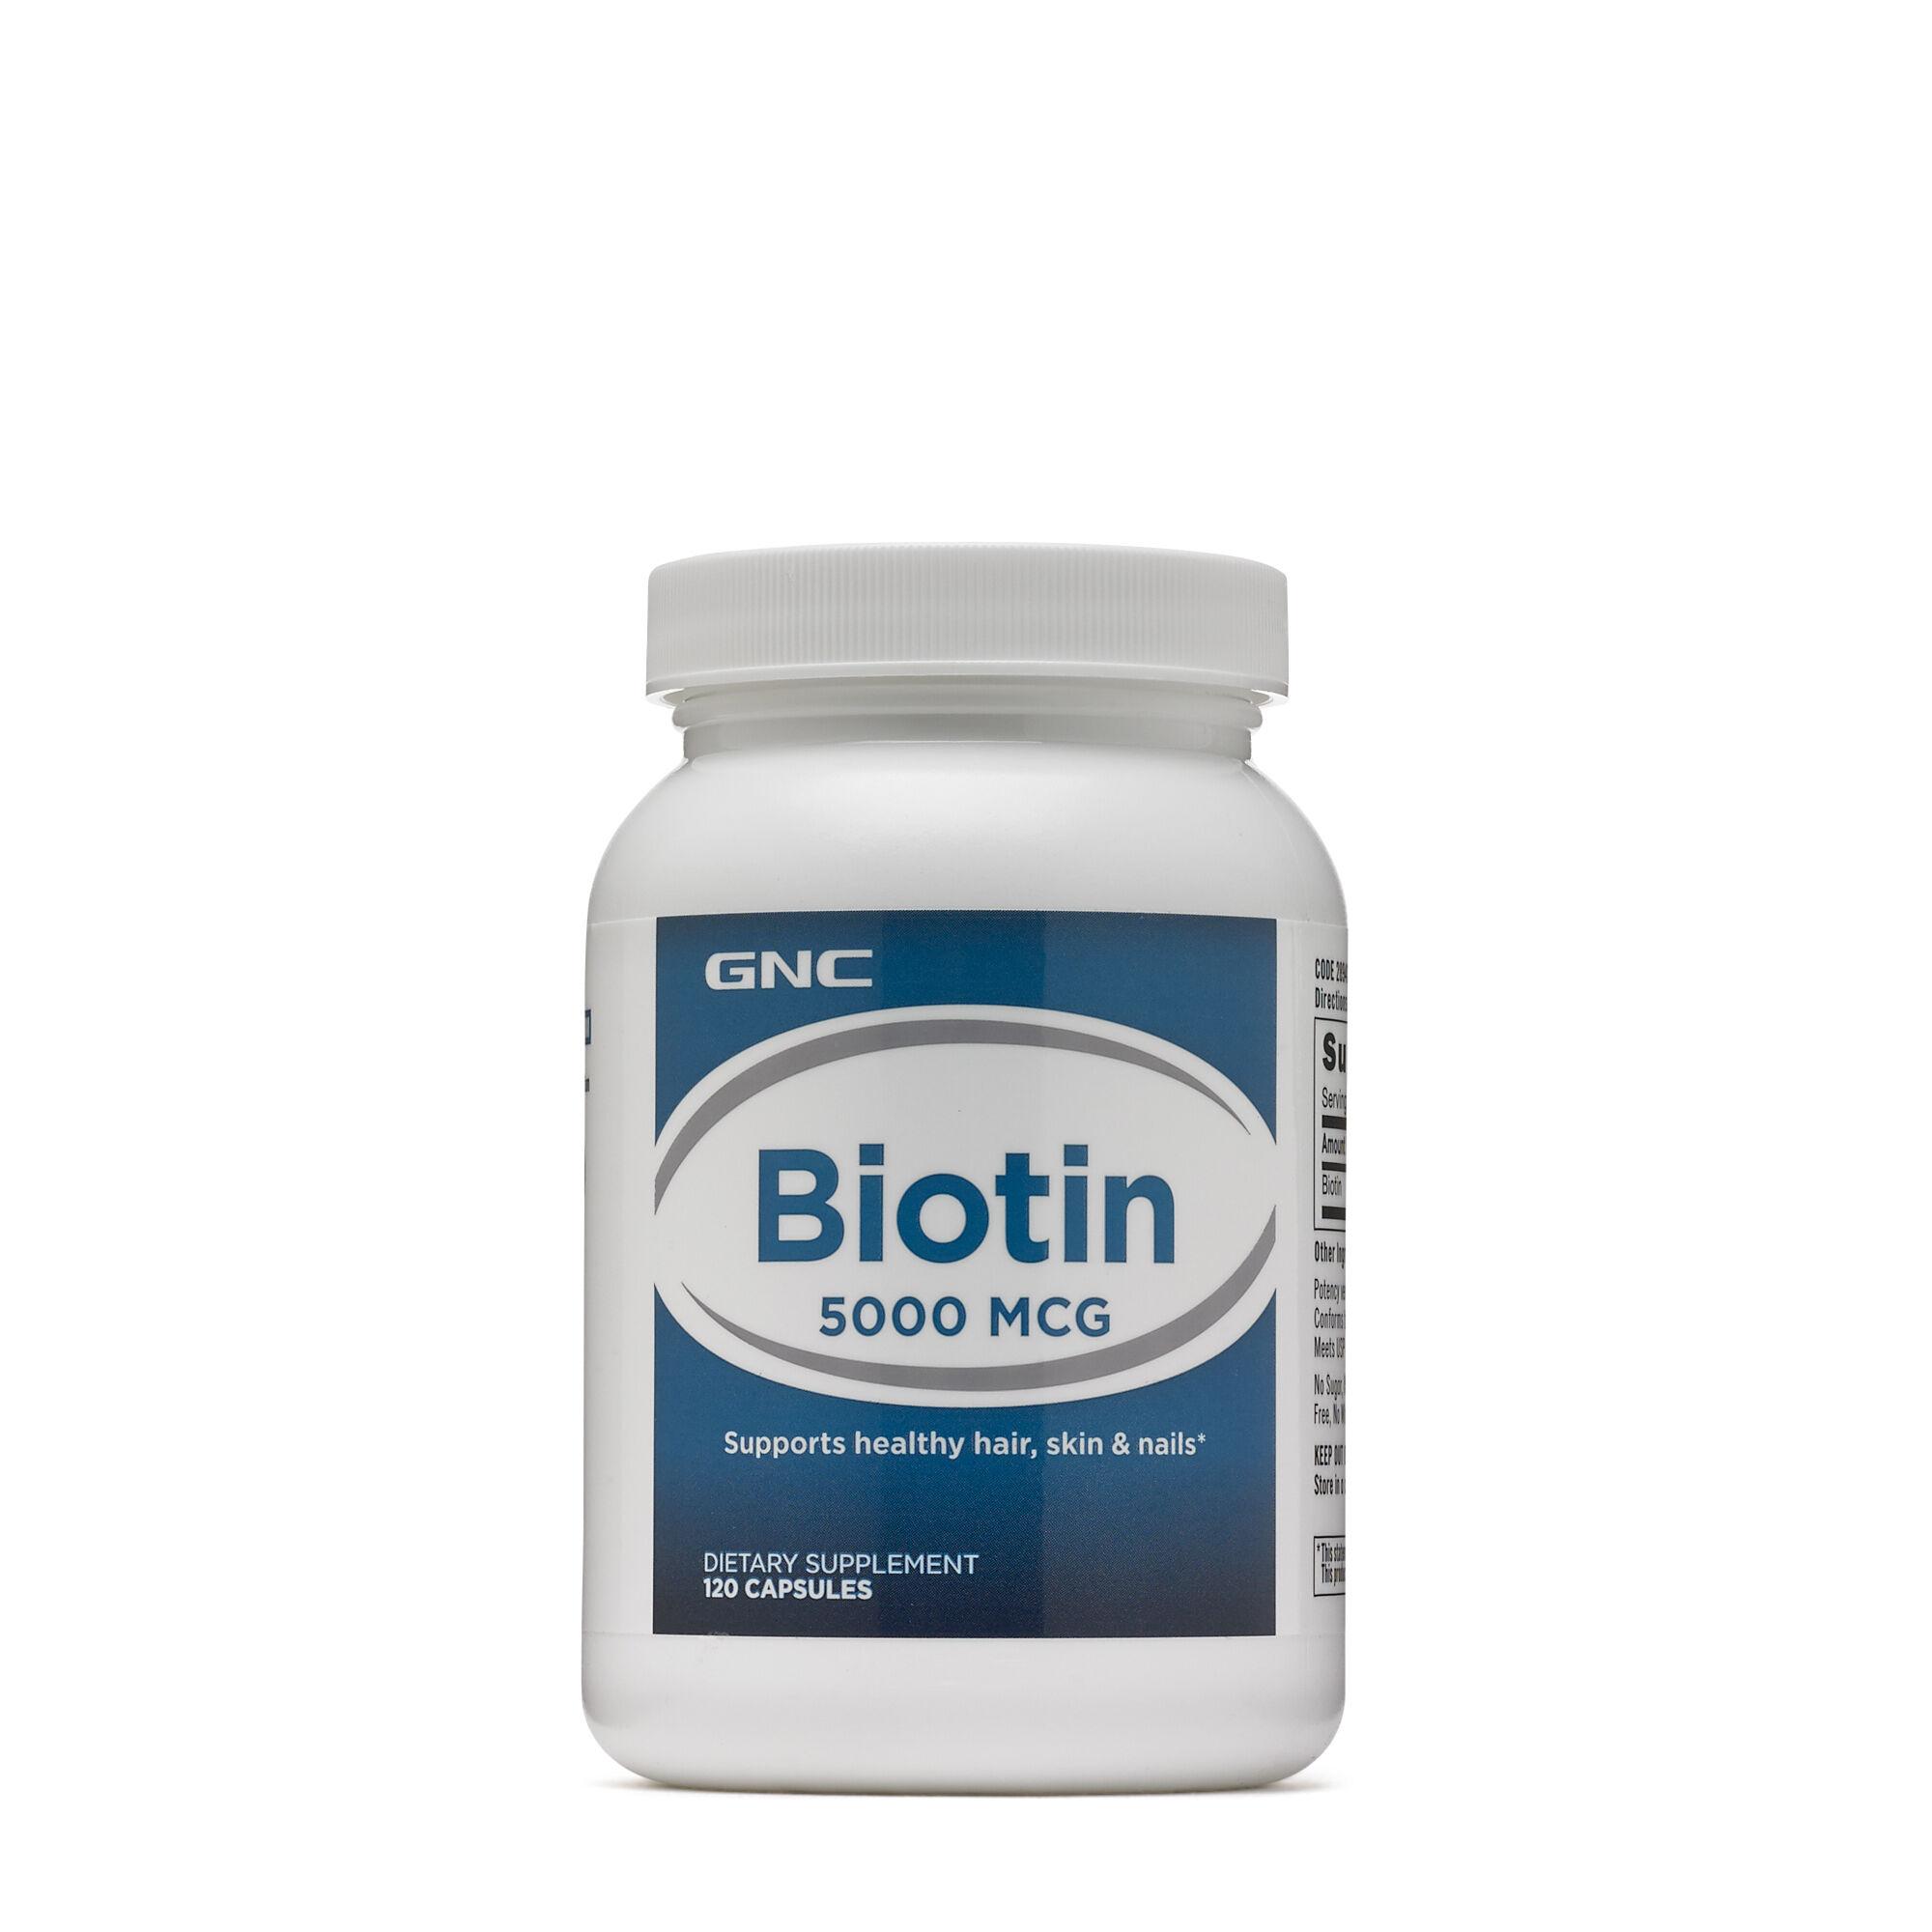 GNC Biotin 5000 mcg